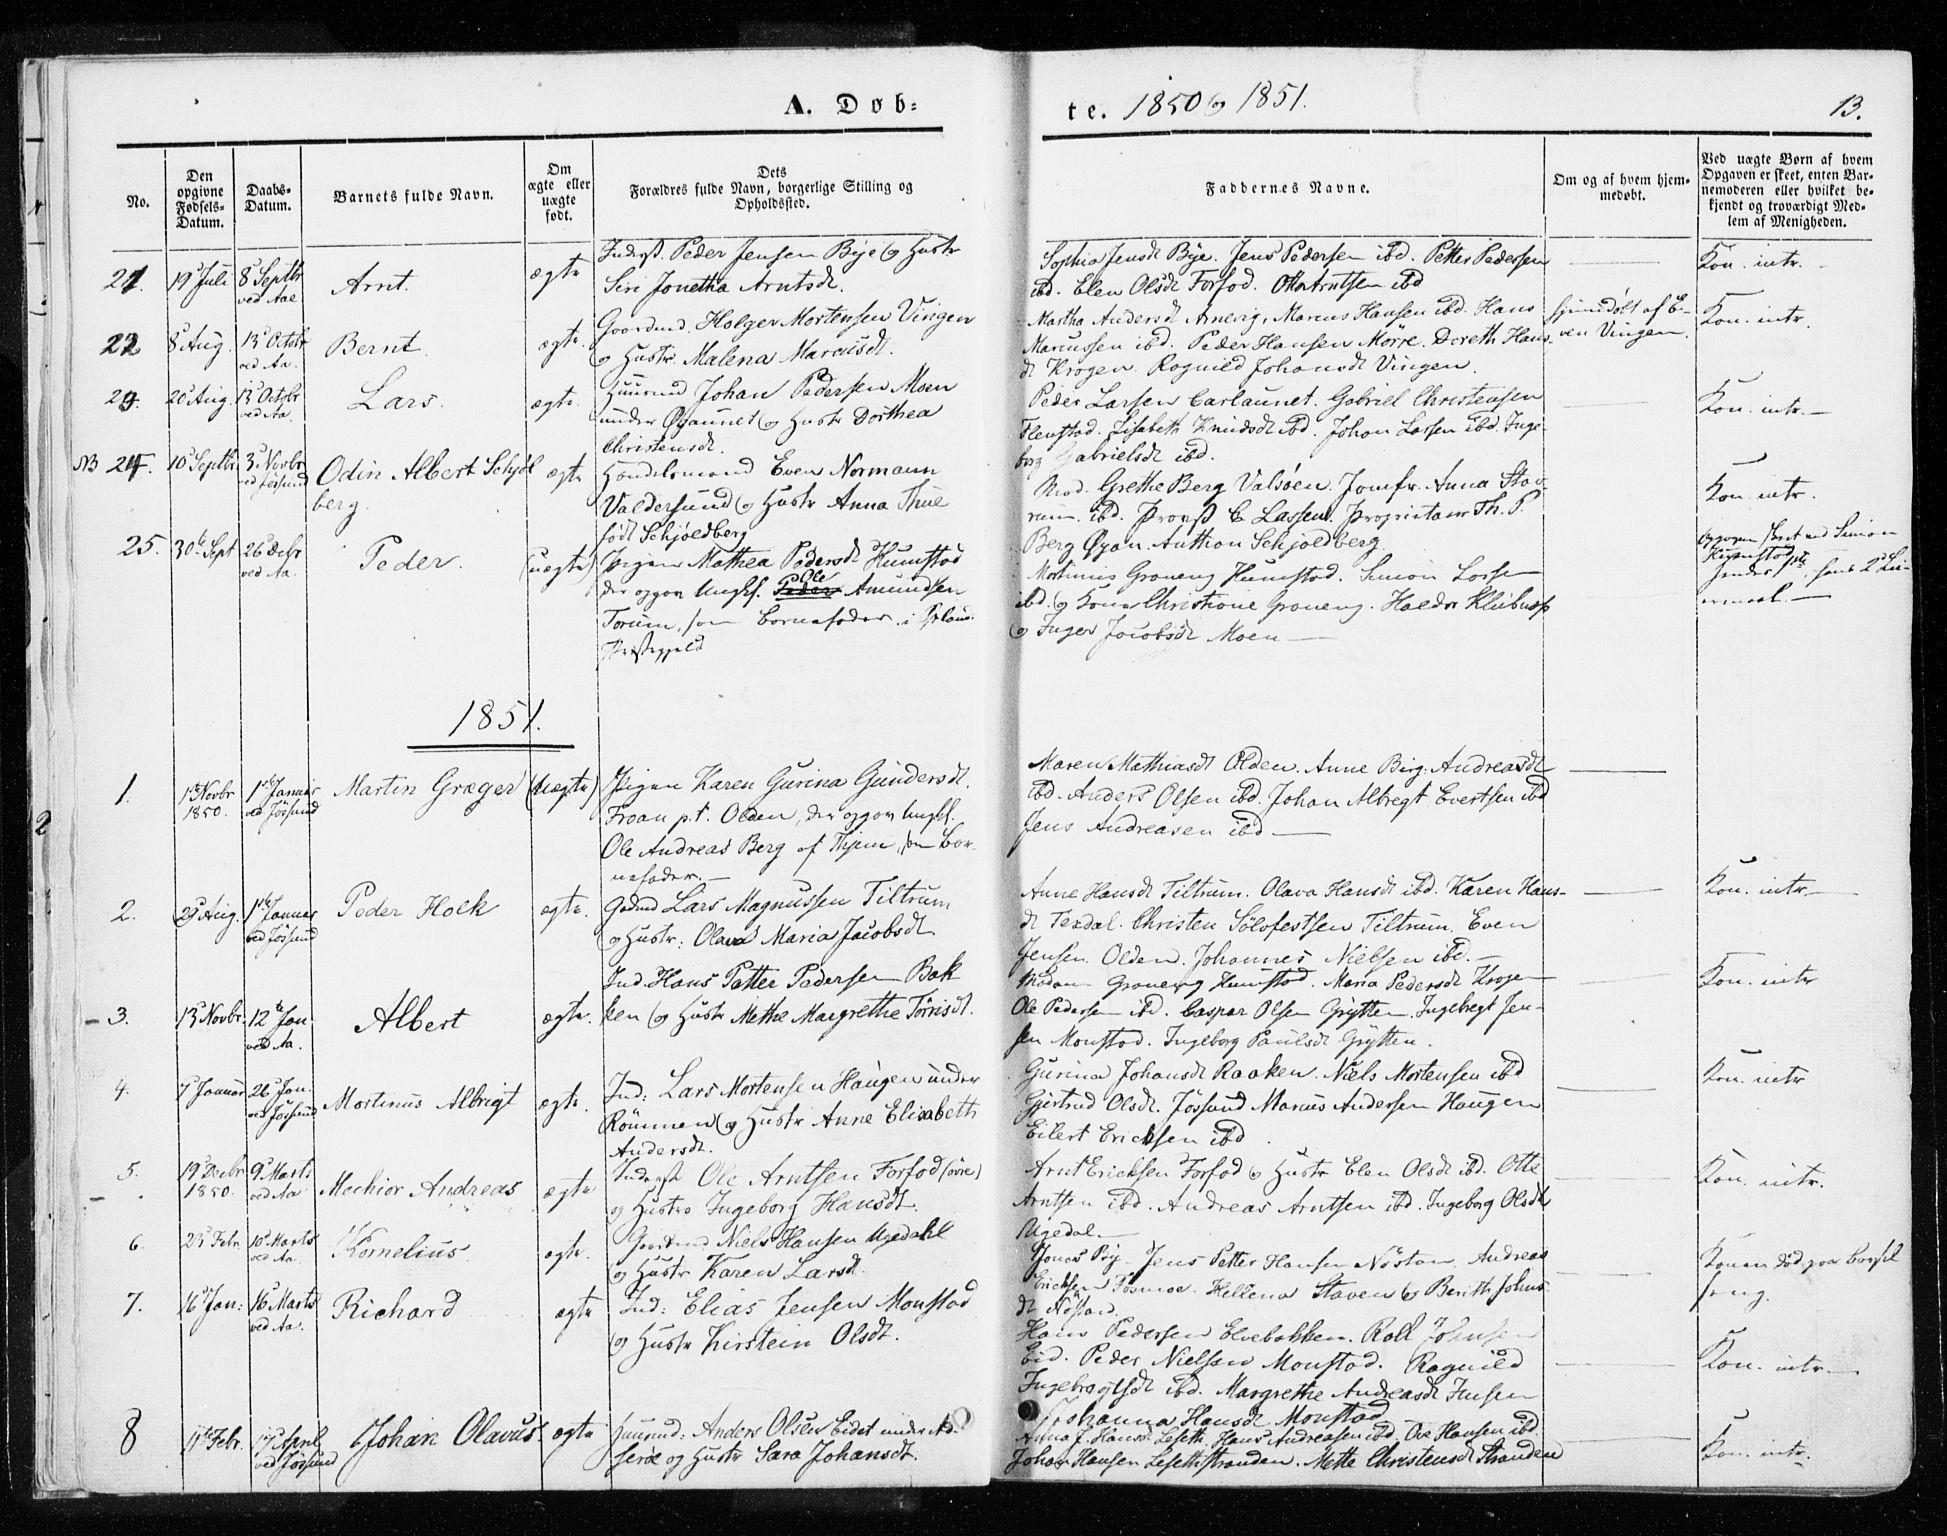 SAT, Ministerialprotokoller, klokkerbøker og fødselsregistre - Sør-Trøndelag, 655/L0677: Parish register (official) no. 655A06, 1847-1860, p. 13